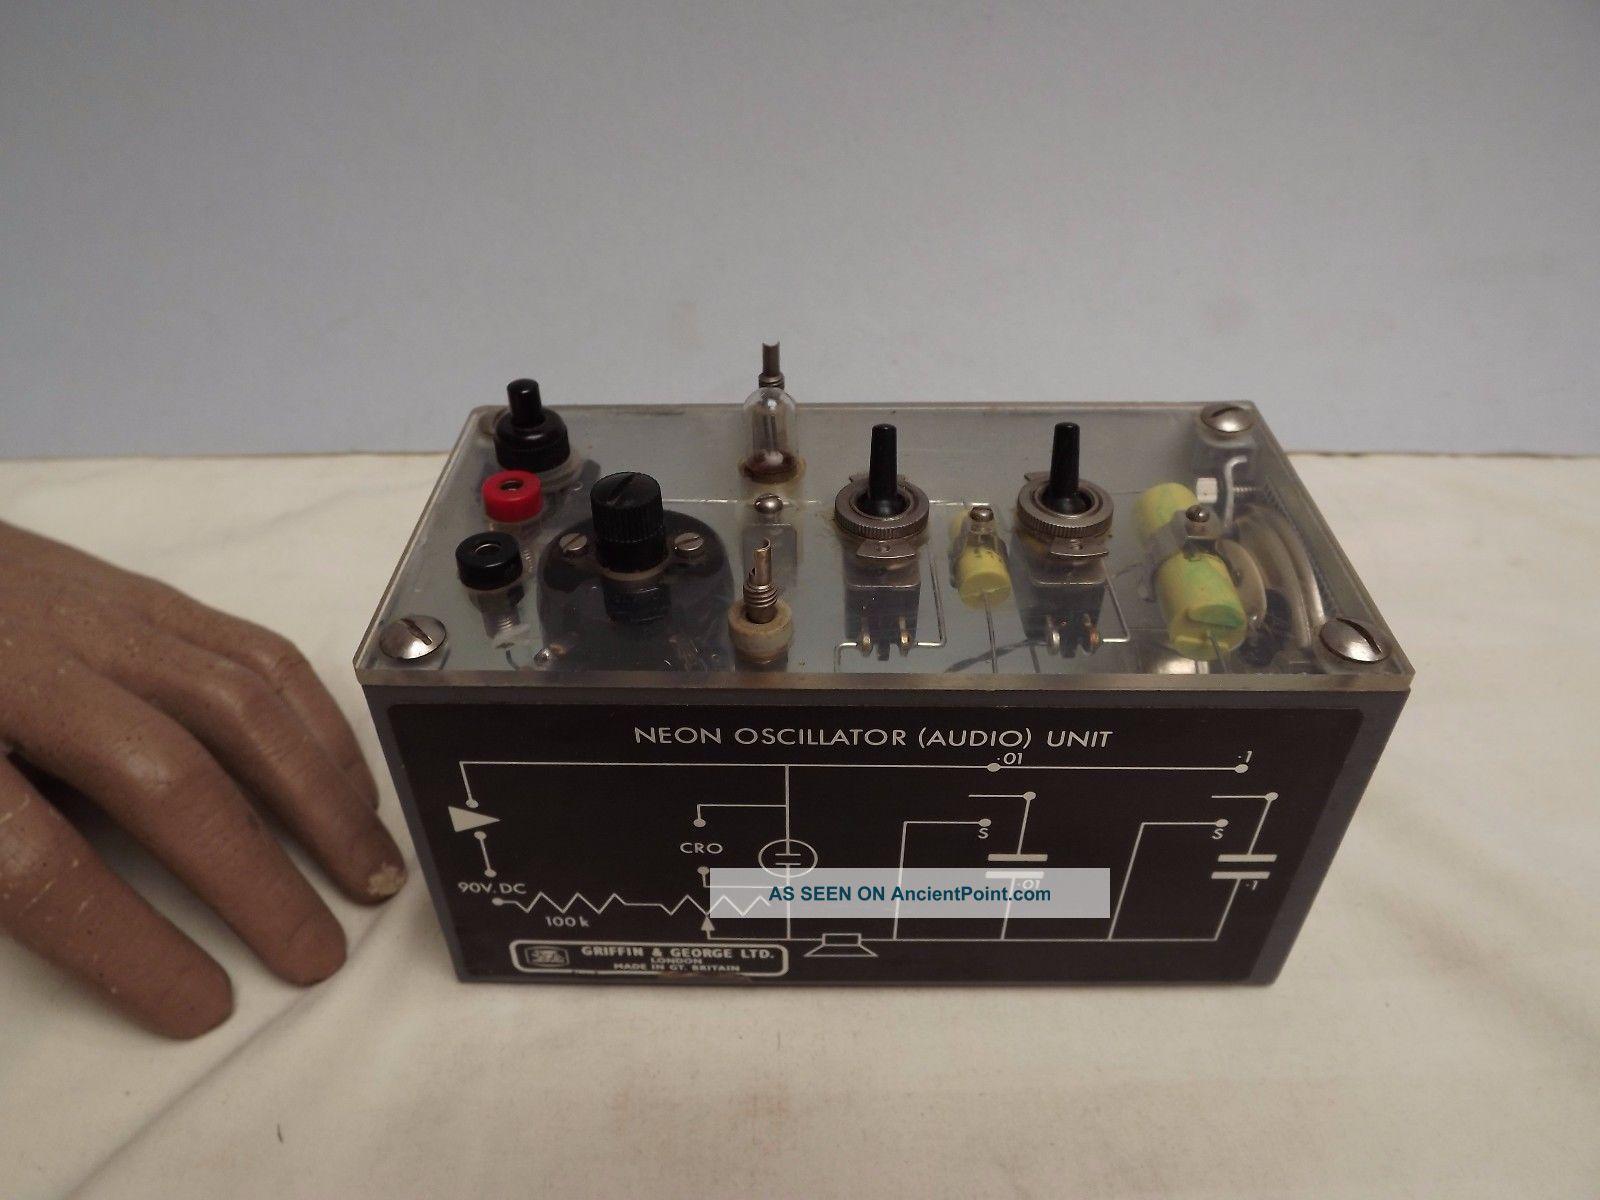 Neon Oscillator Unit ( (audio Oscillator))  Griffin & George (c1960) Other Antique Science Equip photo